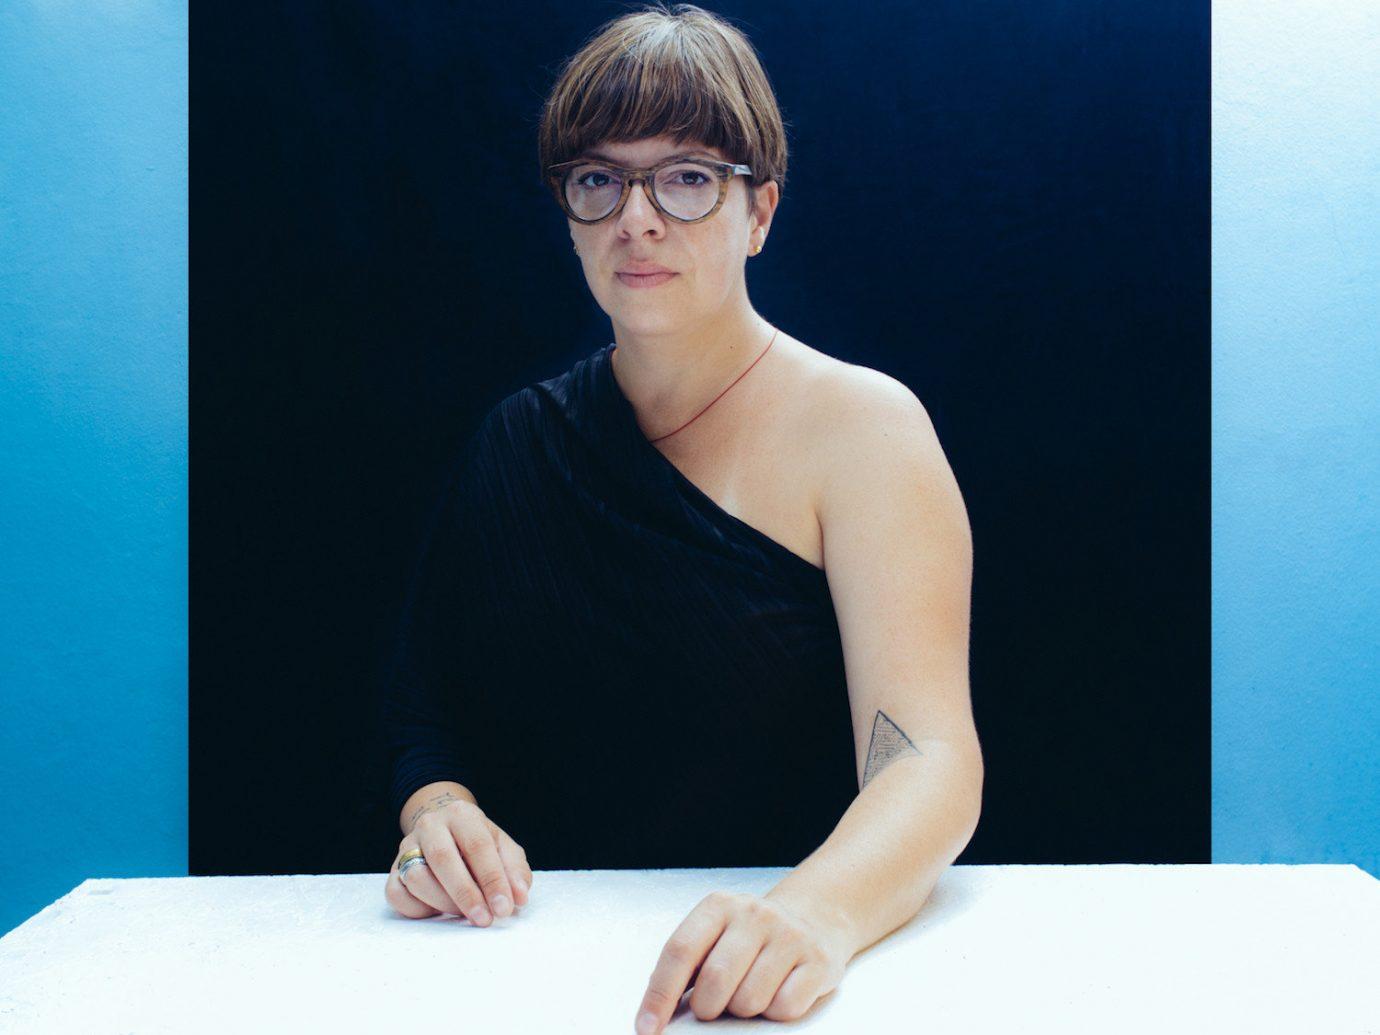 Style + Design person sitting laptop human positions head arm hand posing sense portrait art model photo shoot